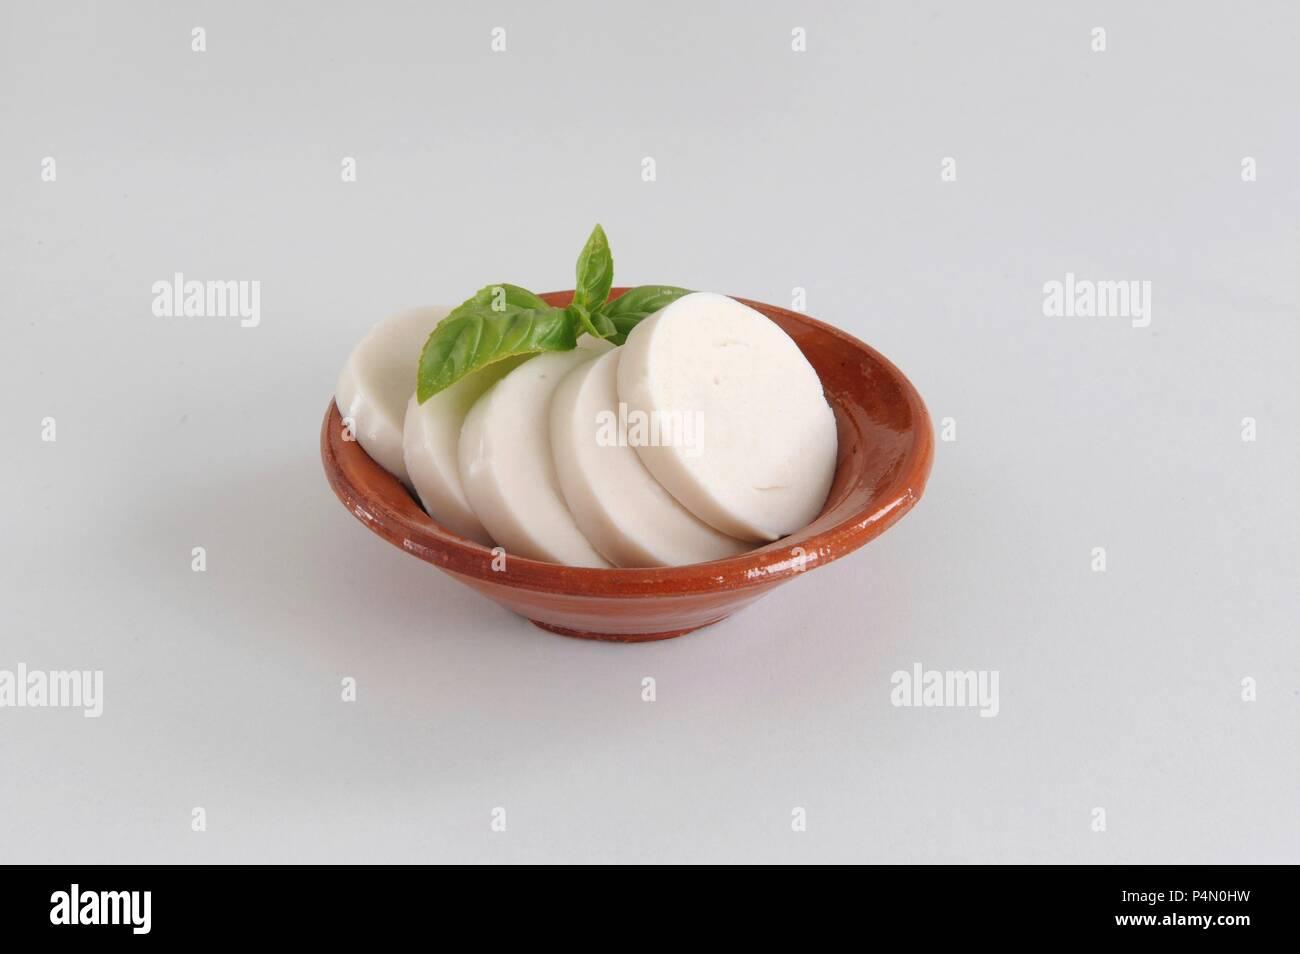 Vegan mozzarella substitute in a terracotta bowl - Stock Image